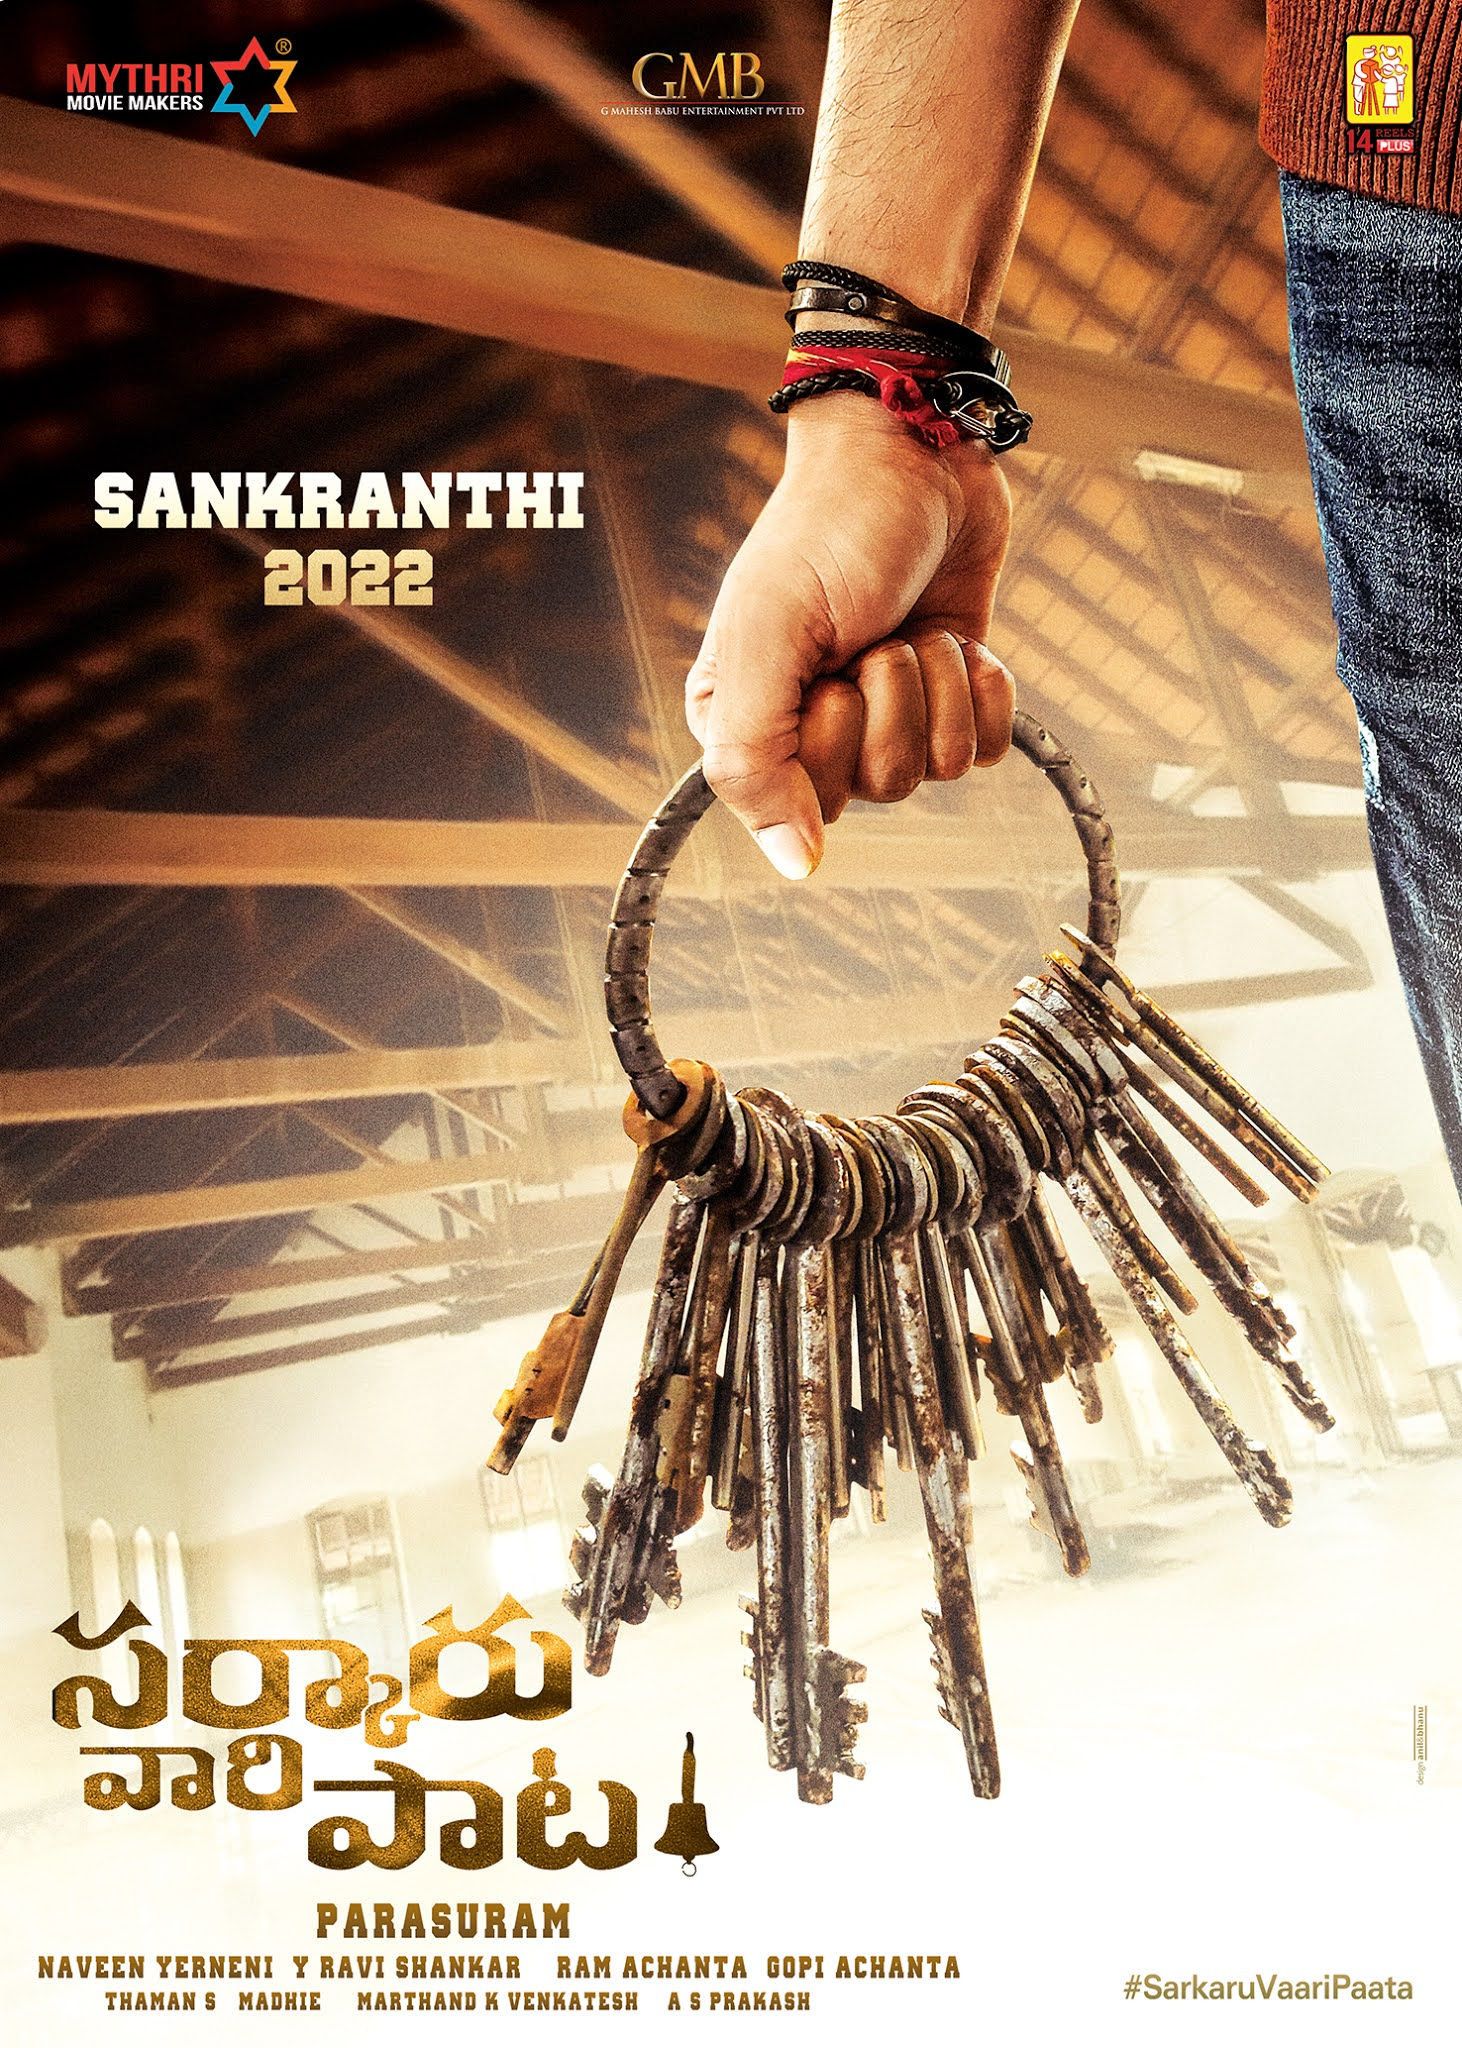 Mahesh Babu Sarkaru Vaari Paata movie release Sankranthi 2022 poster HD